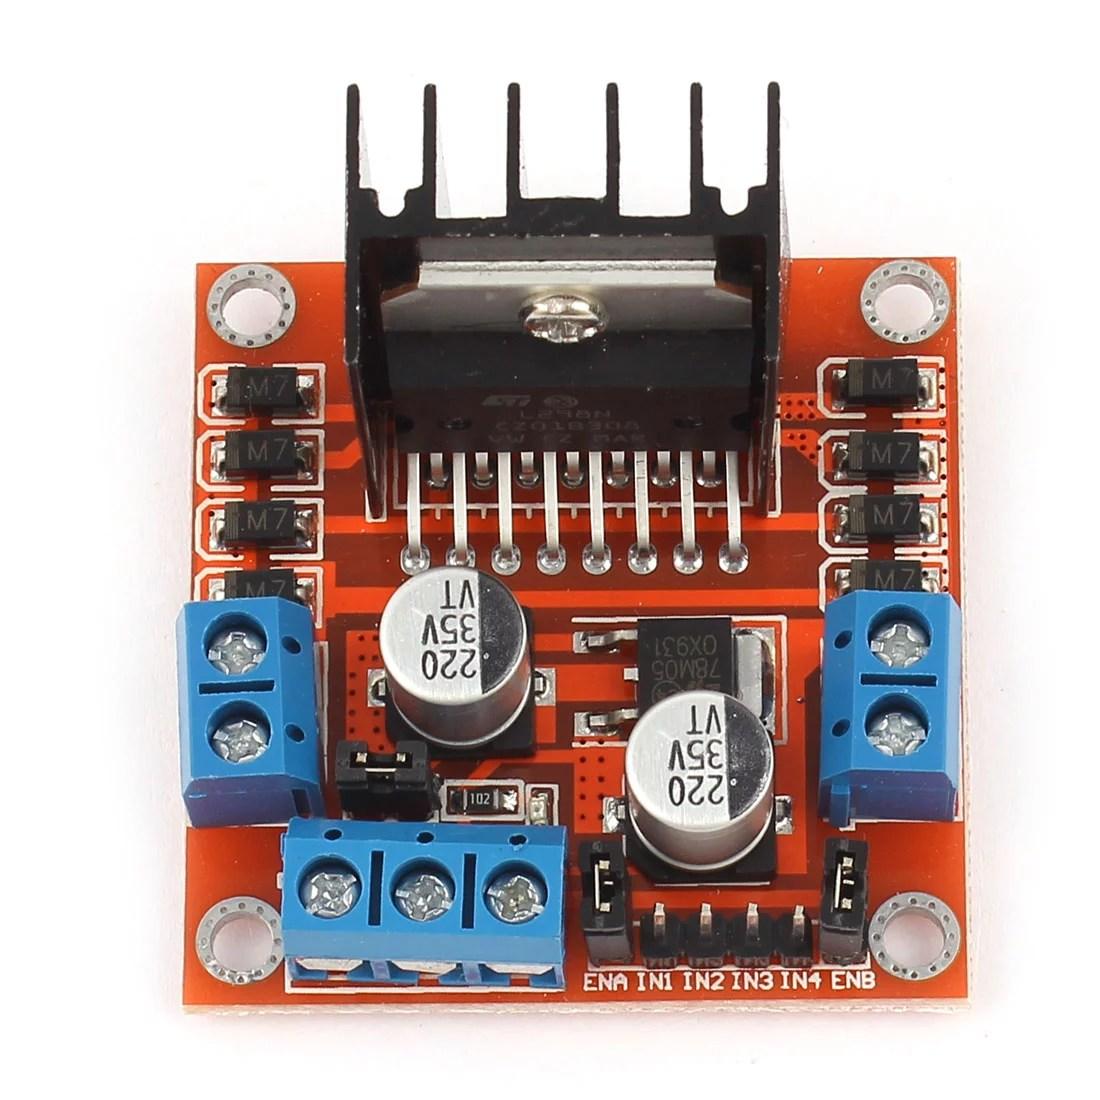 l298 h bridge circuit diagram fender squier bass wiring unique bargains l298n dual dc stepper motor drive controller board module for arduino walmart com